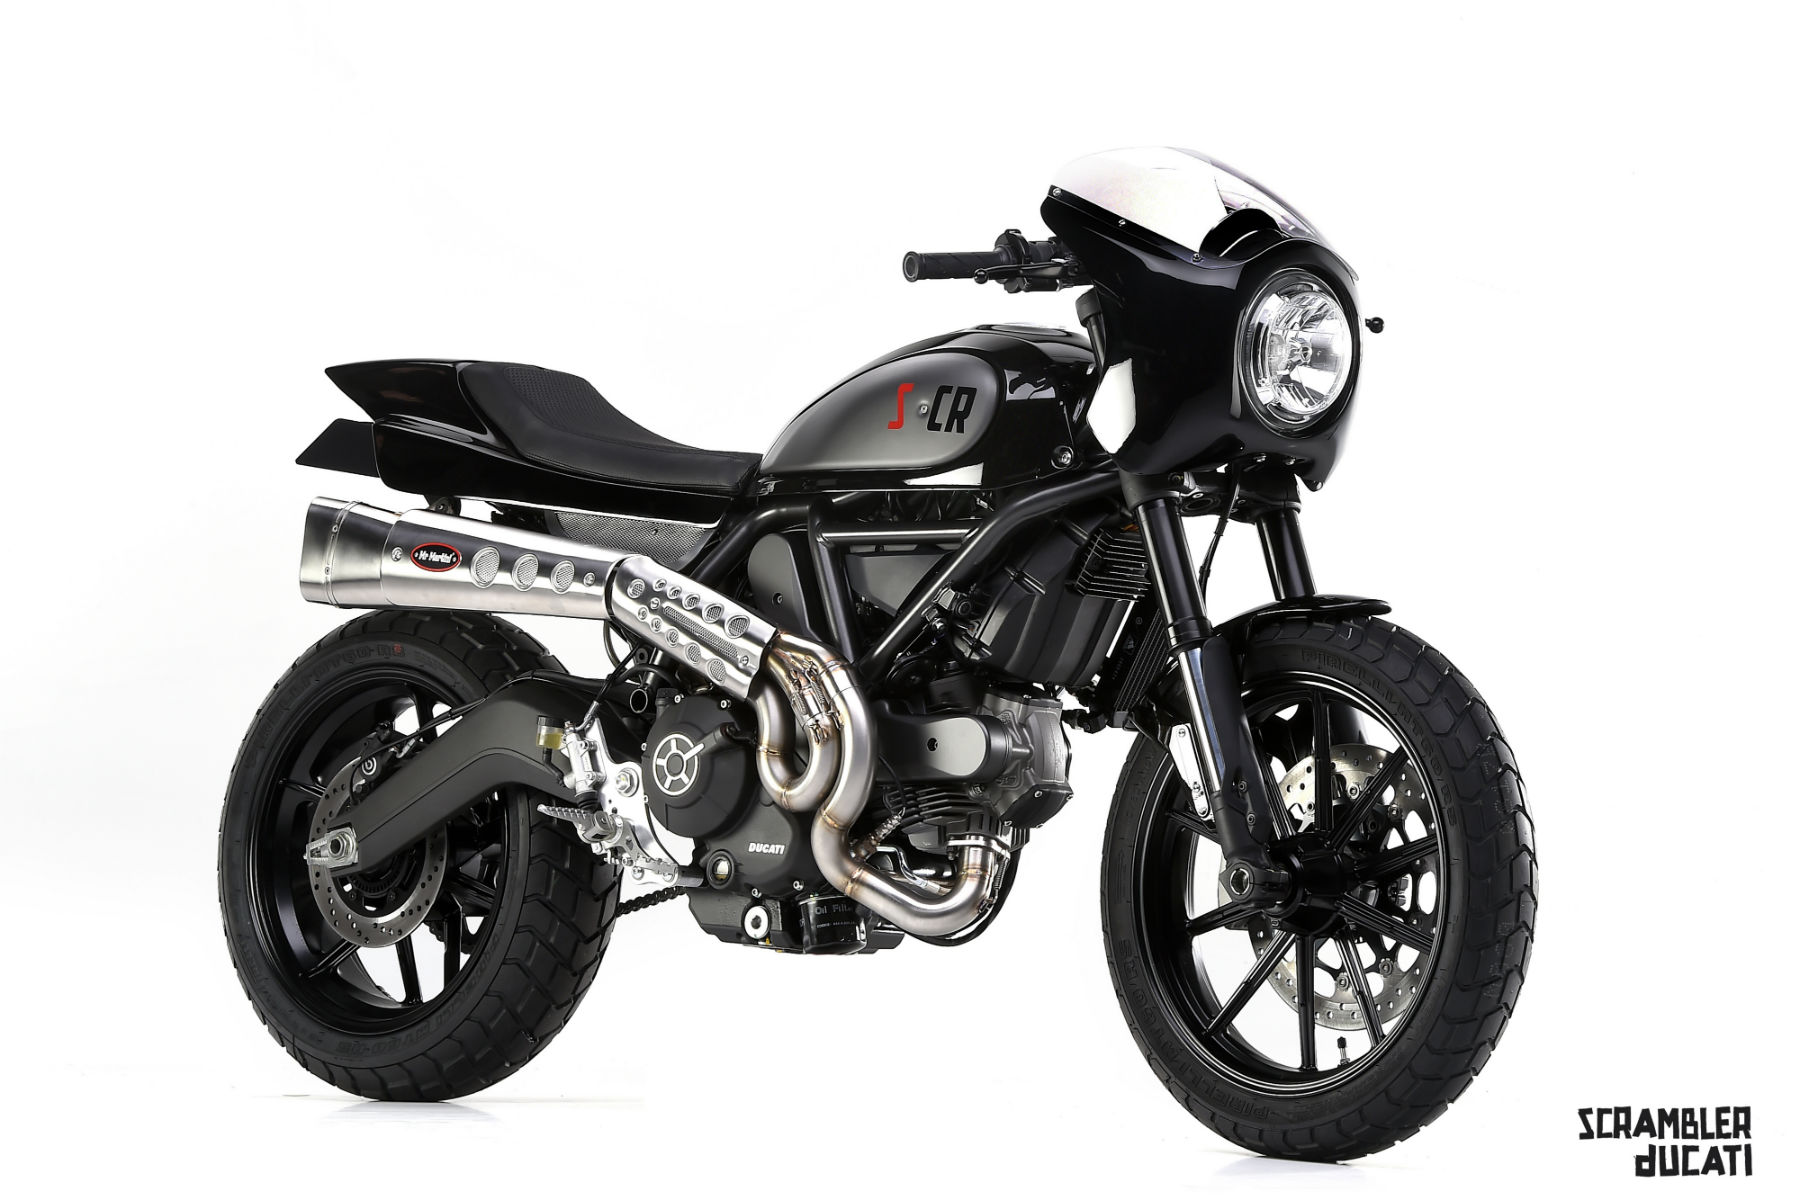 First customised Ducati Scramblers revealed